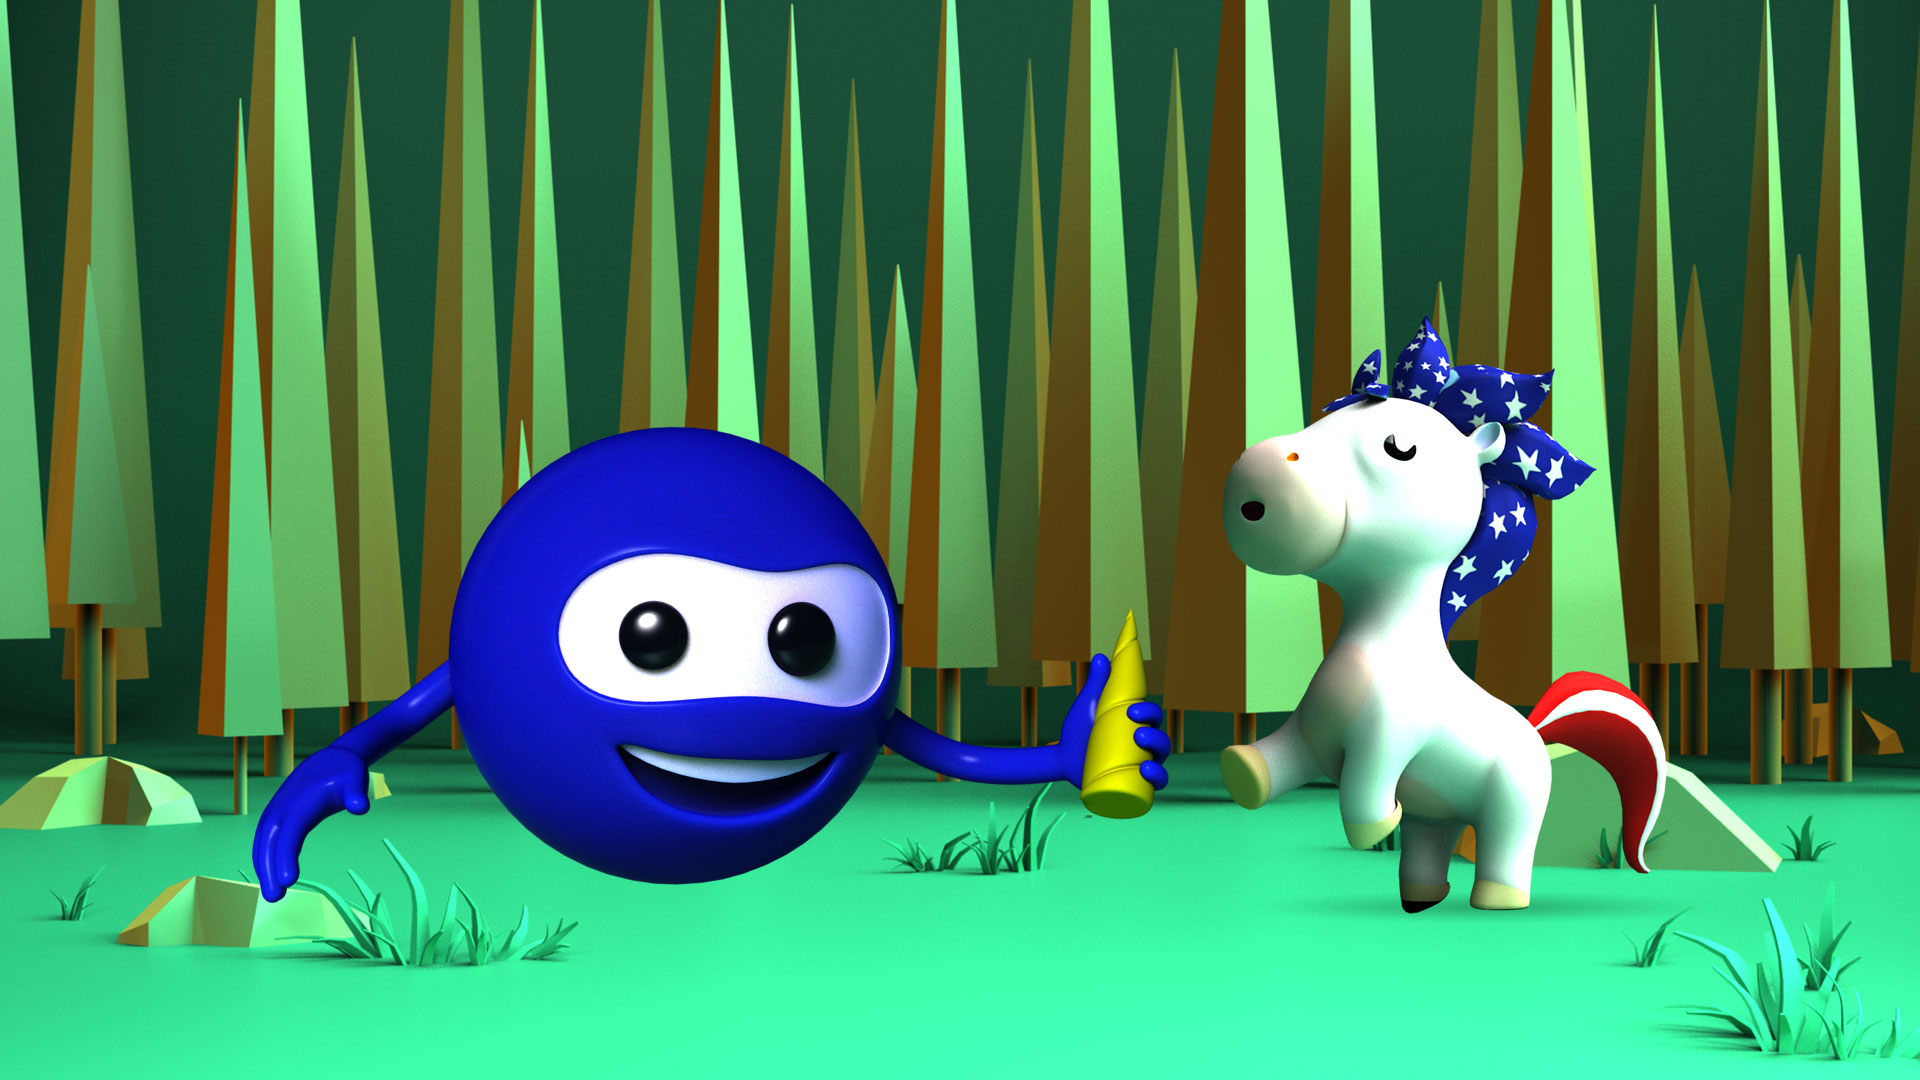 Unicorn_scene